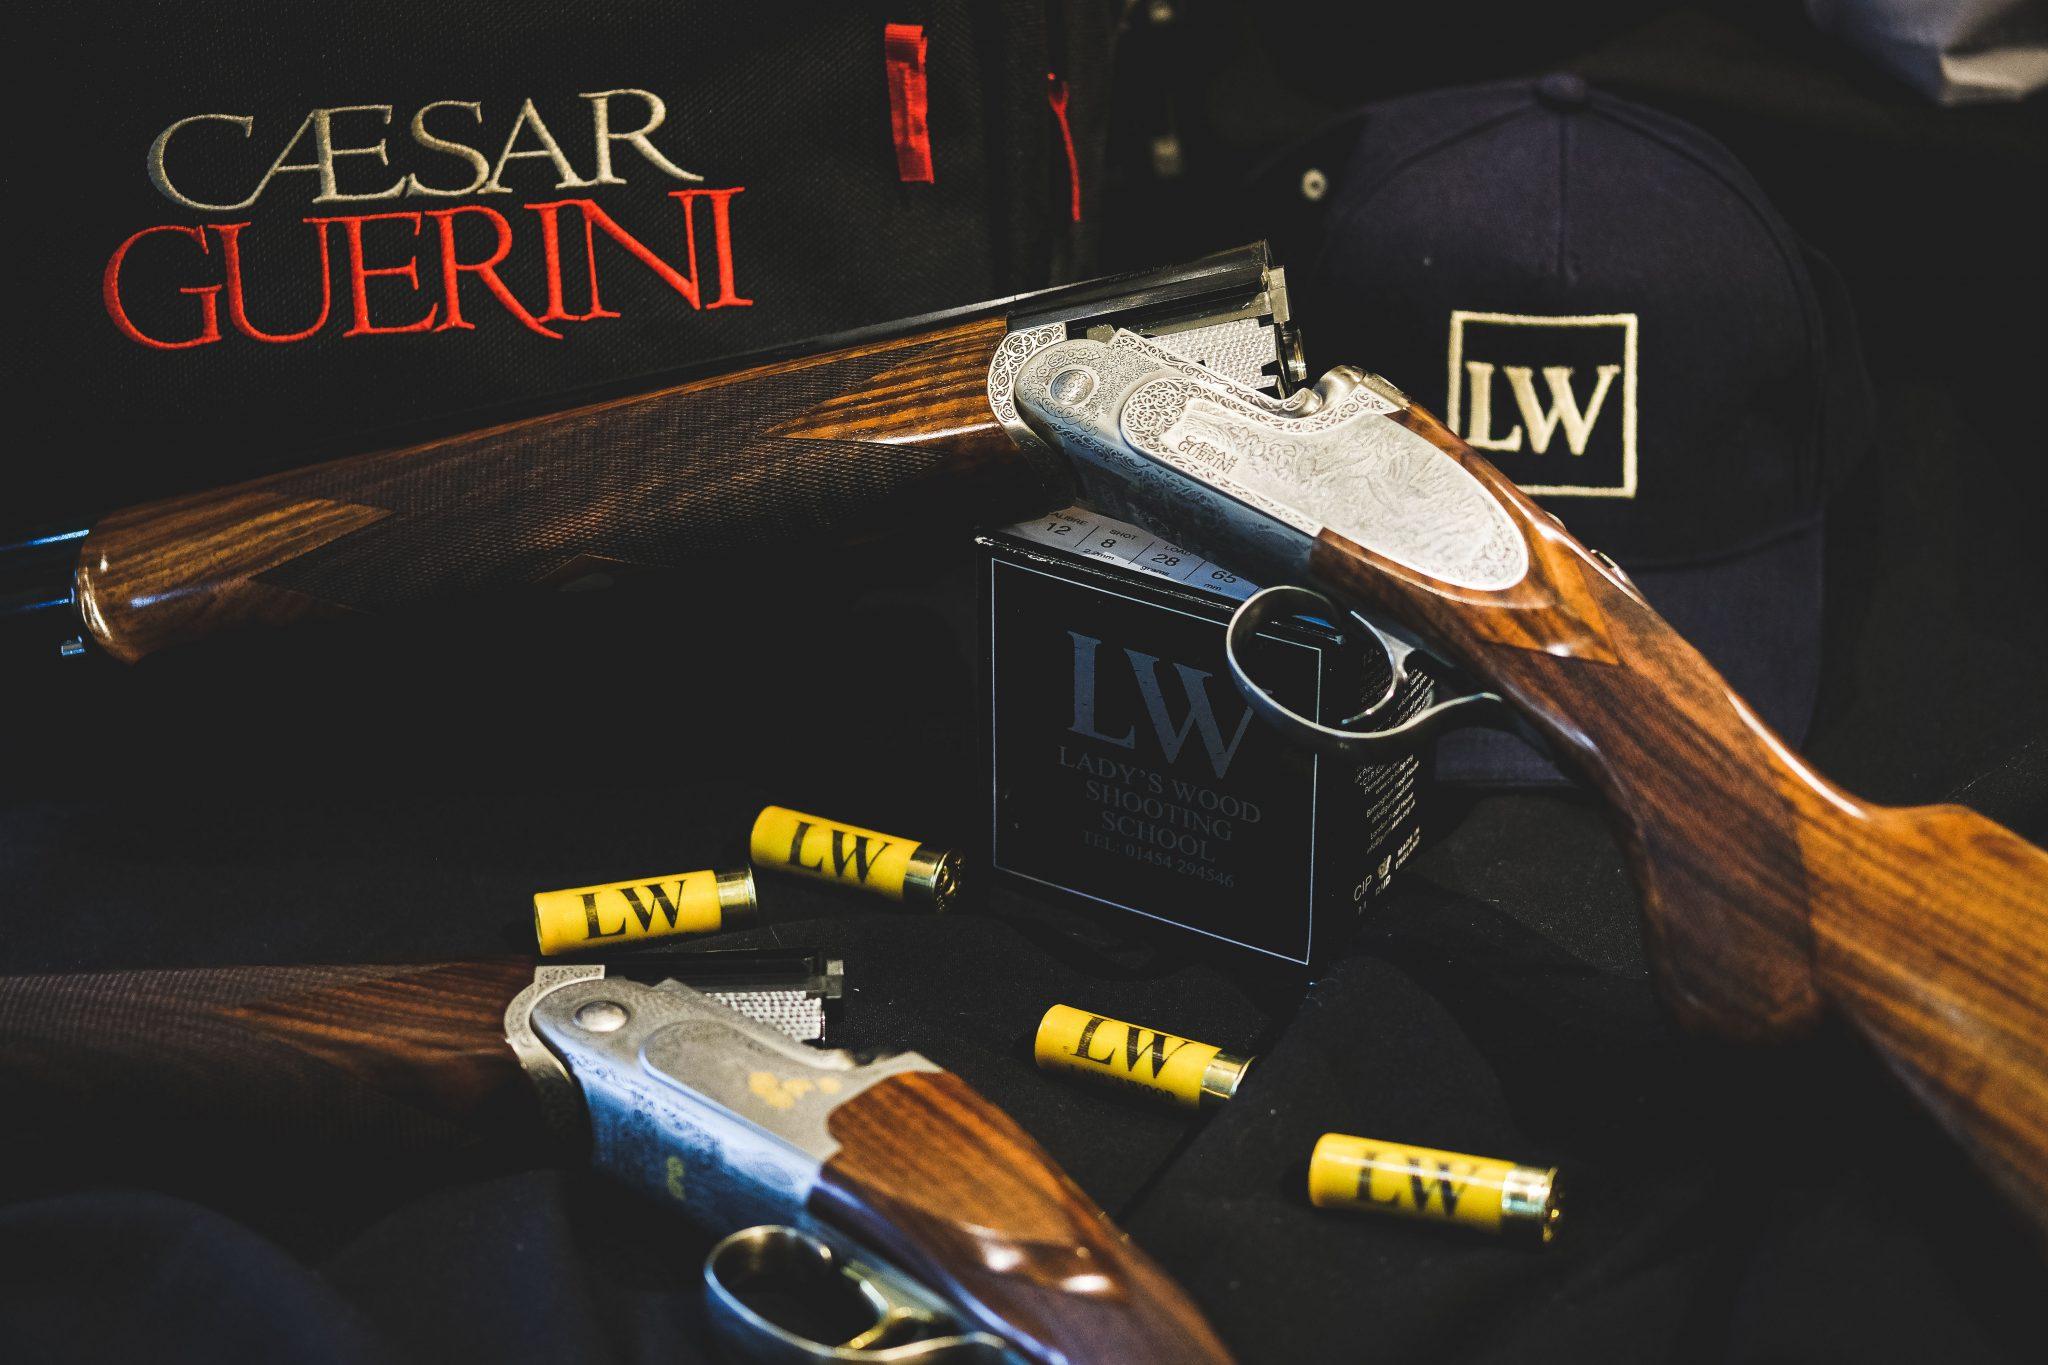 New Lady's Wood school guns from Caesar Guerini